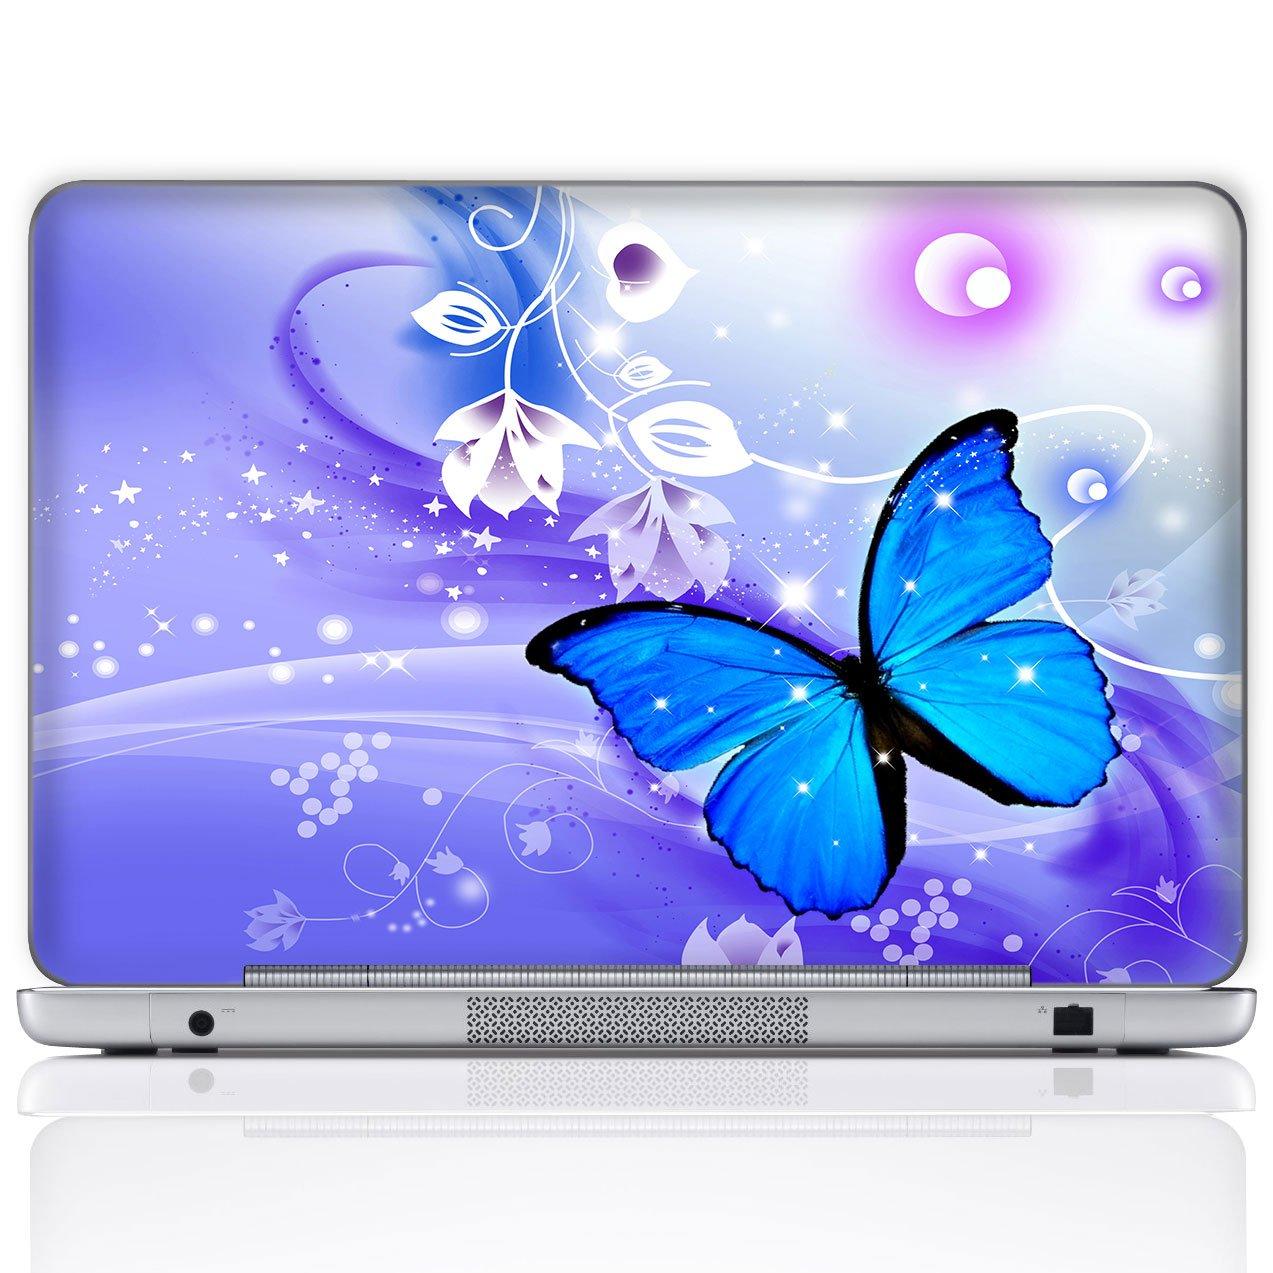 Meffort Inc 17 17.3 Inch Laptop Notebook Skin Sticker Cover Art Decal (Free Wrist pad) - Blue Purple Butterfly